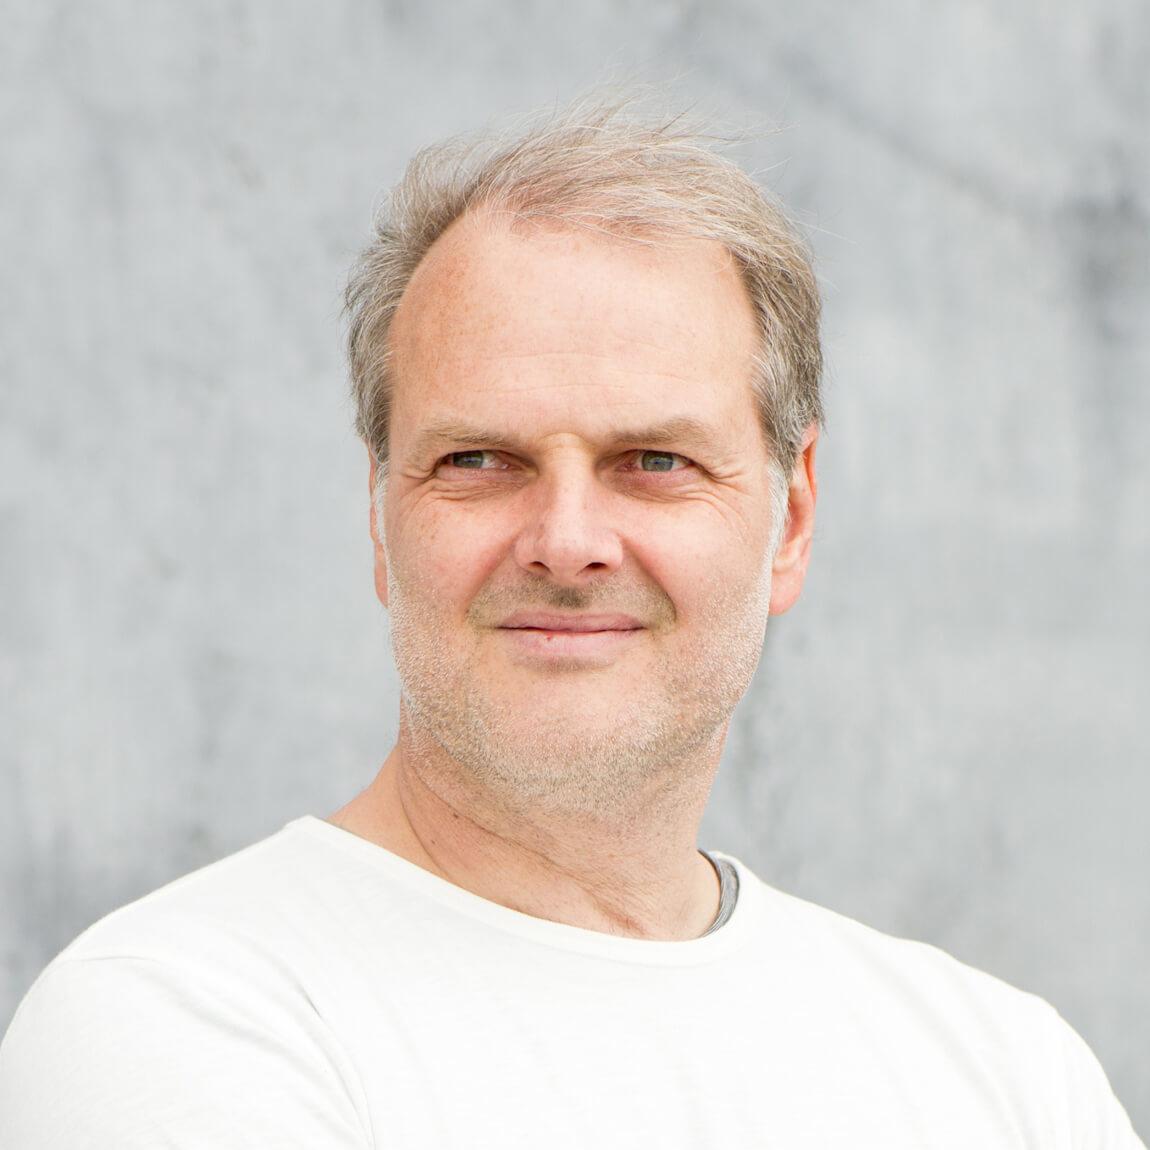 Dr. Ronald Kandelhard